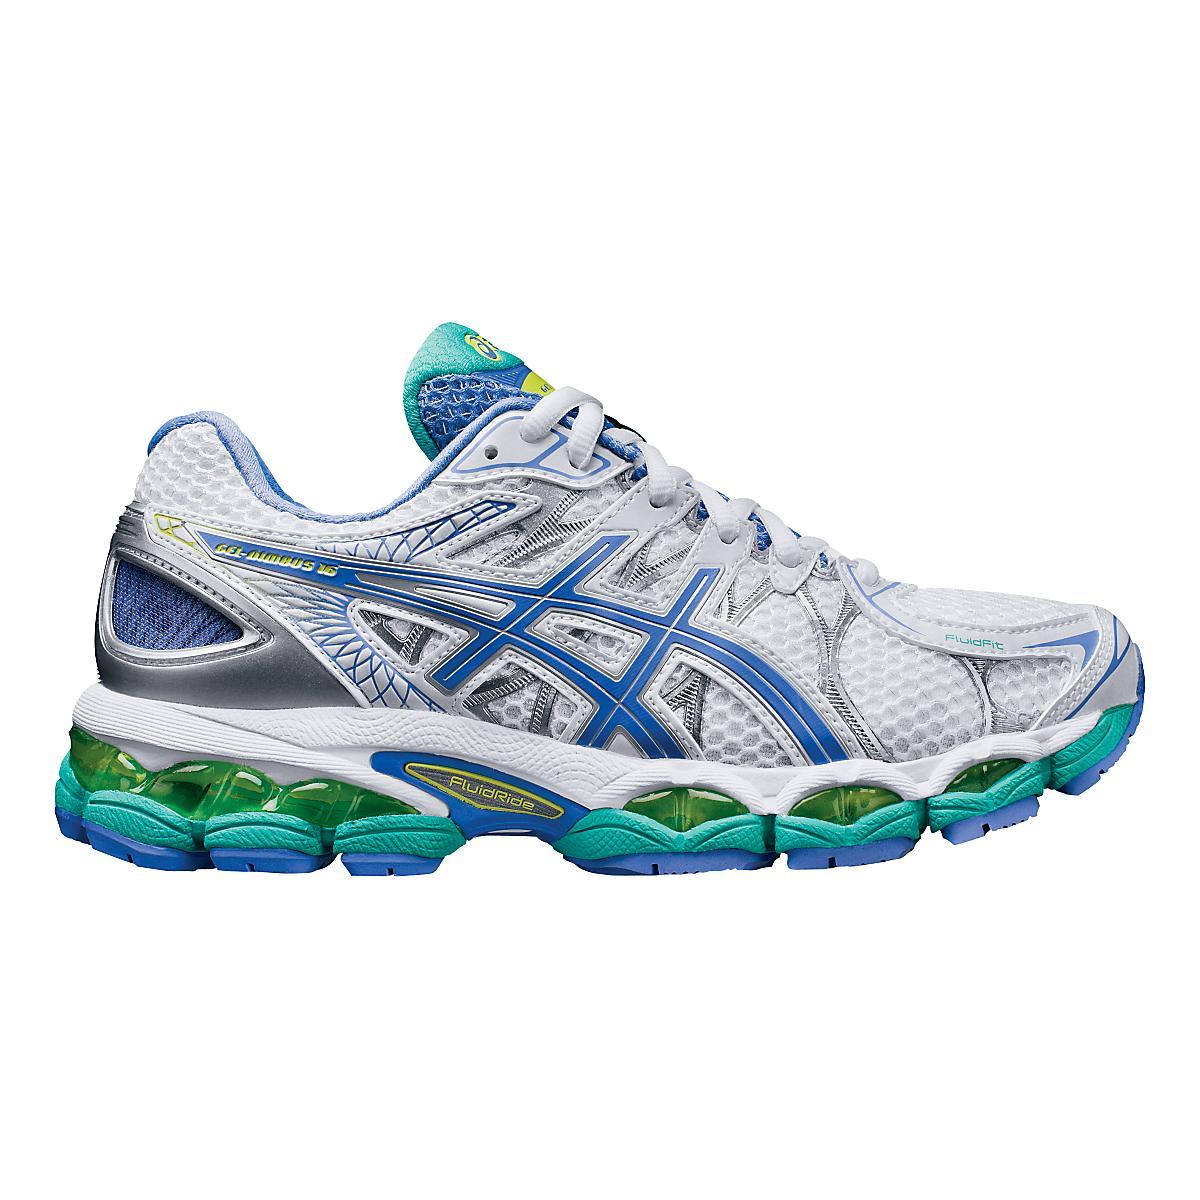 finalizando Vegetales Secretario  Womens ASICS GEL-Nimbus 16 Running Shoe at Road Runner Sports